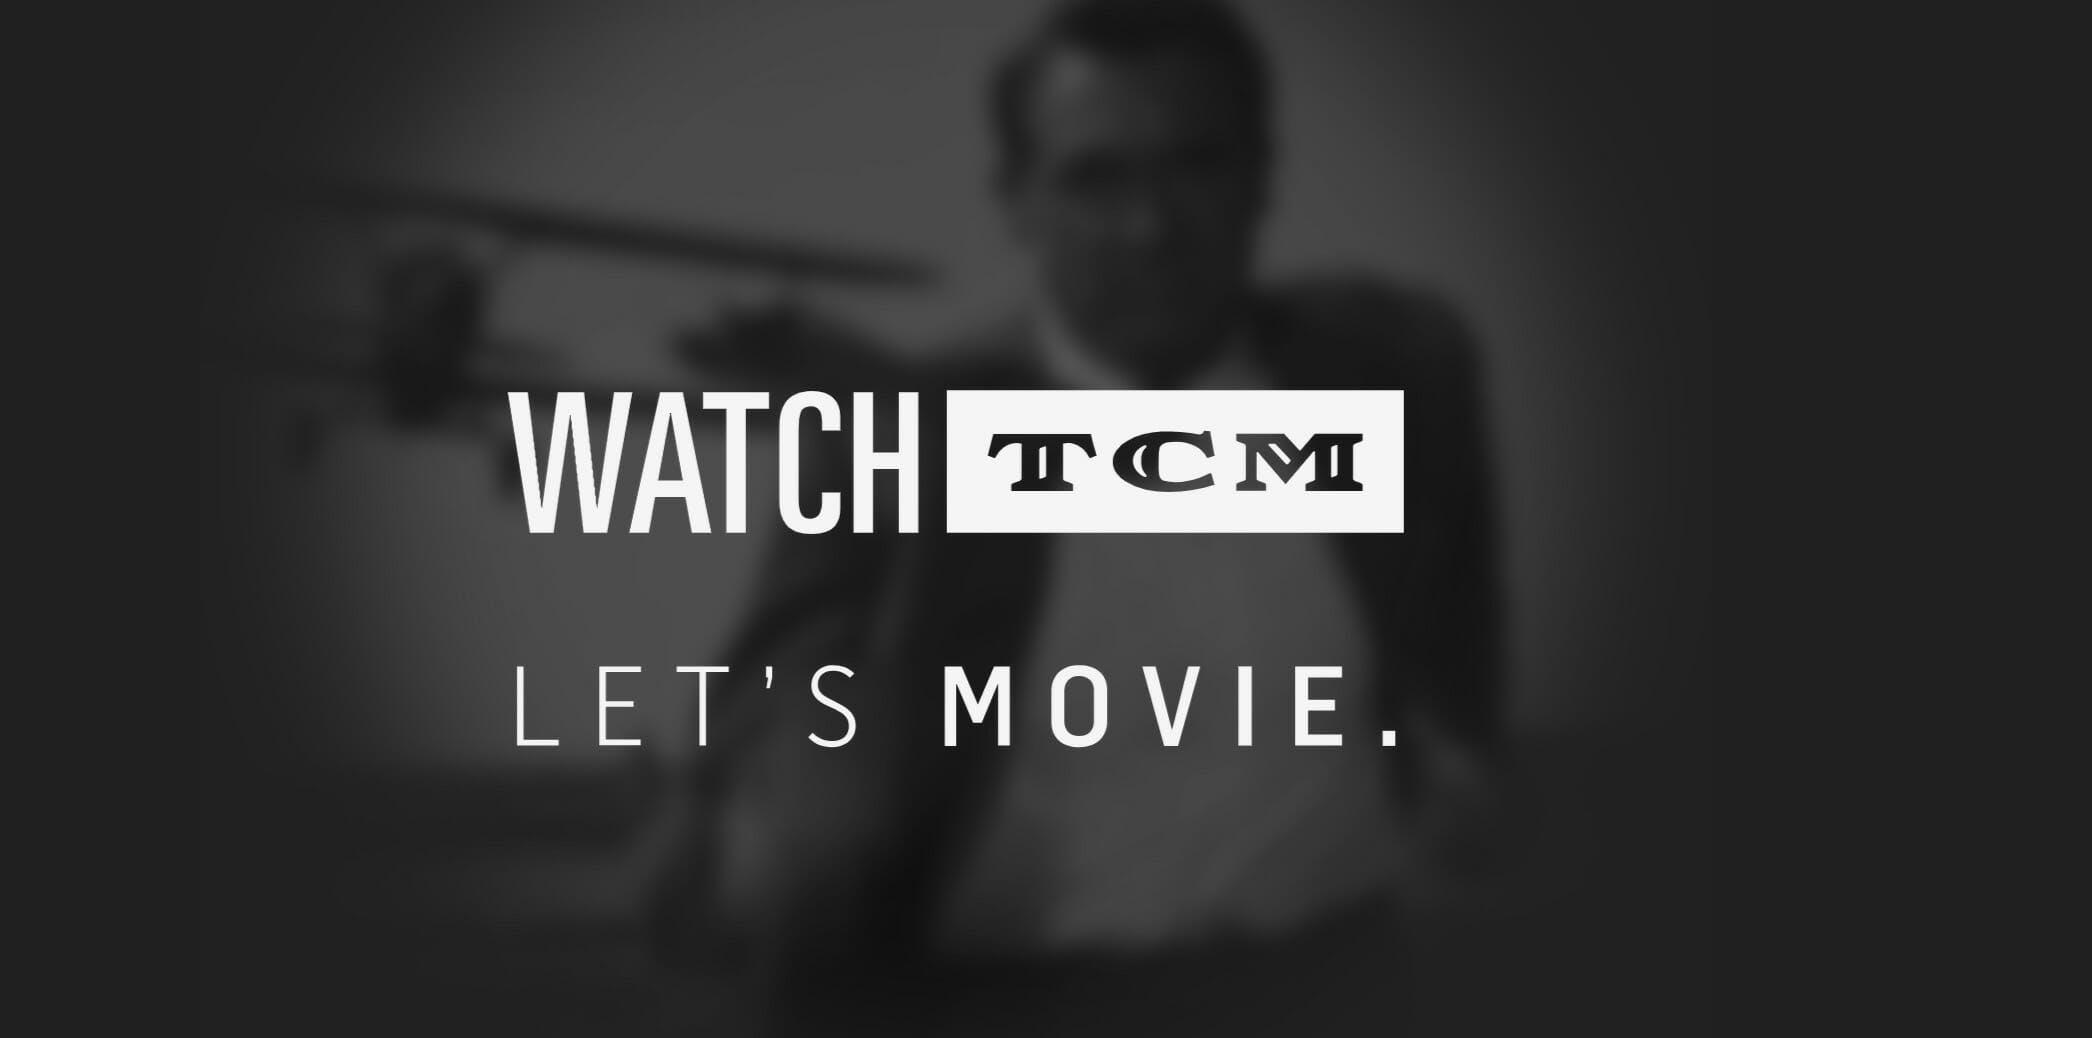 watch tcm on demand